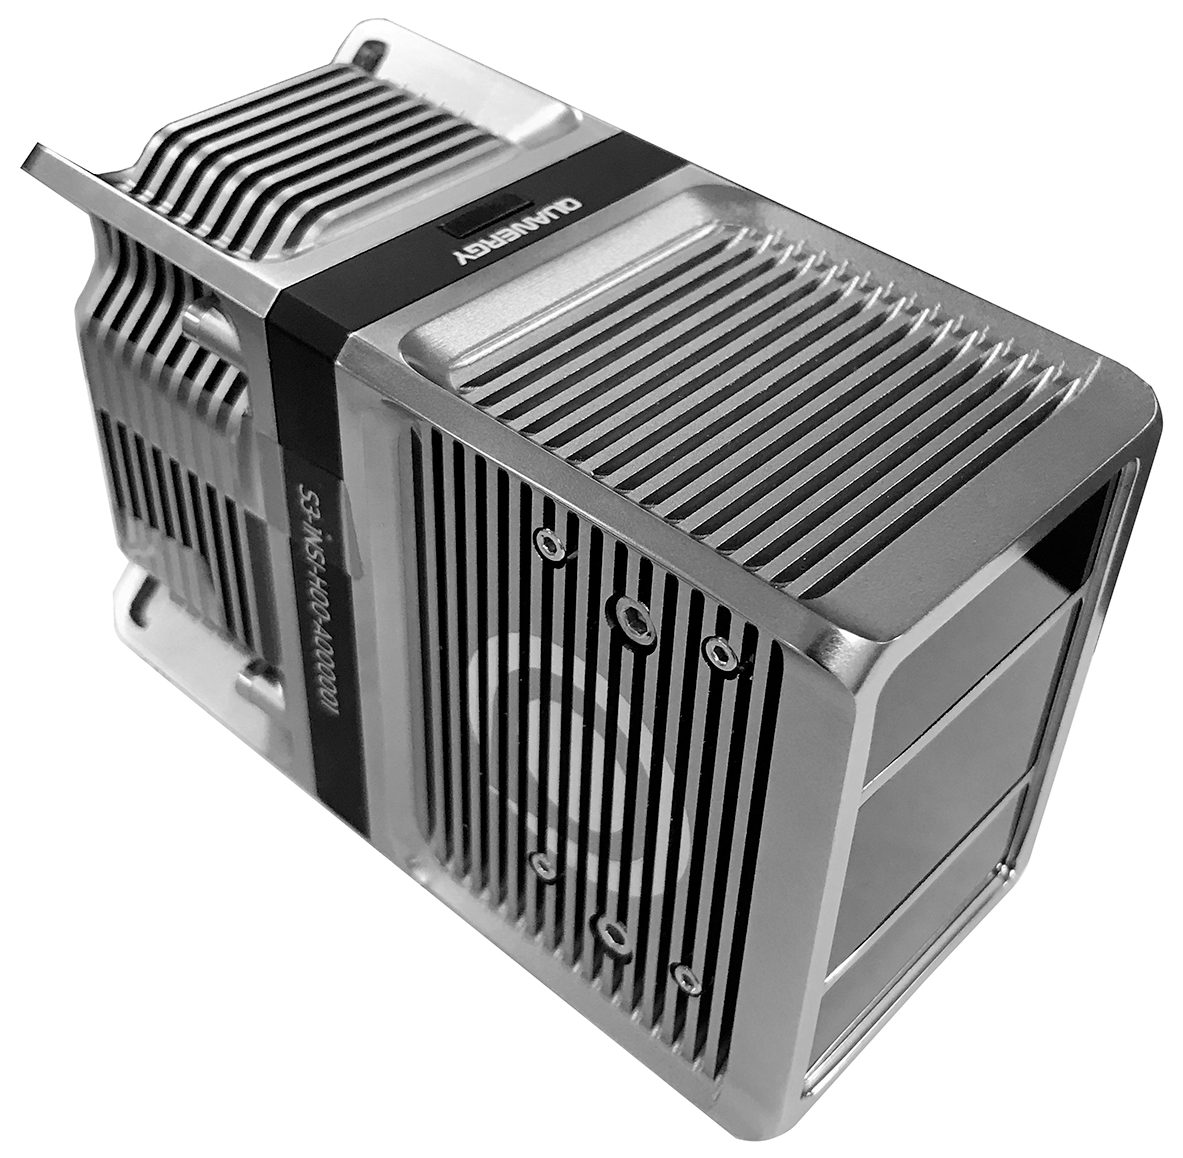 Box-like DoorGuard access device